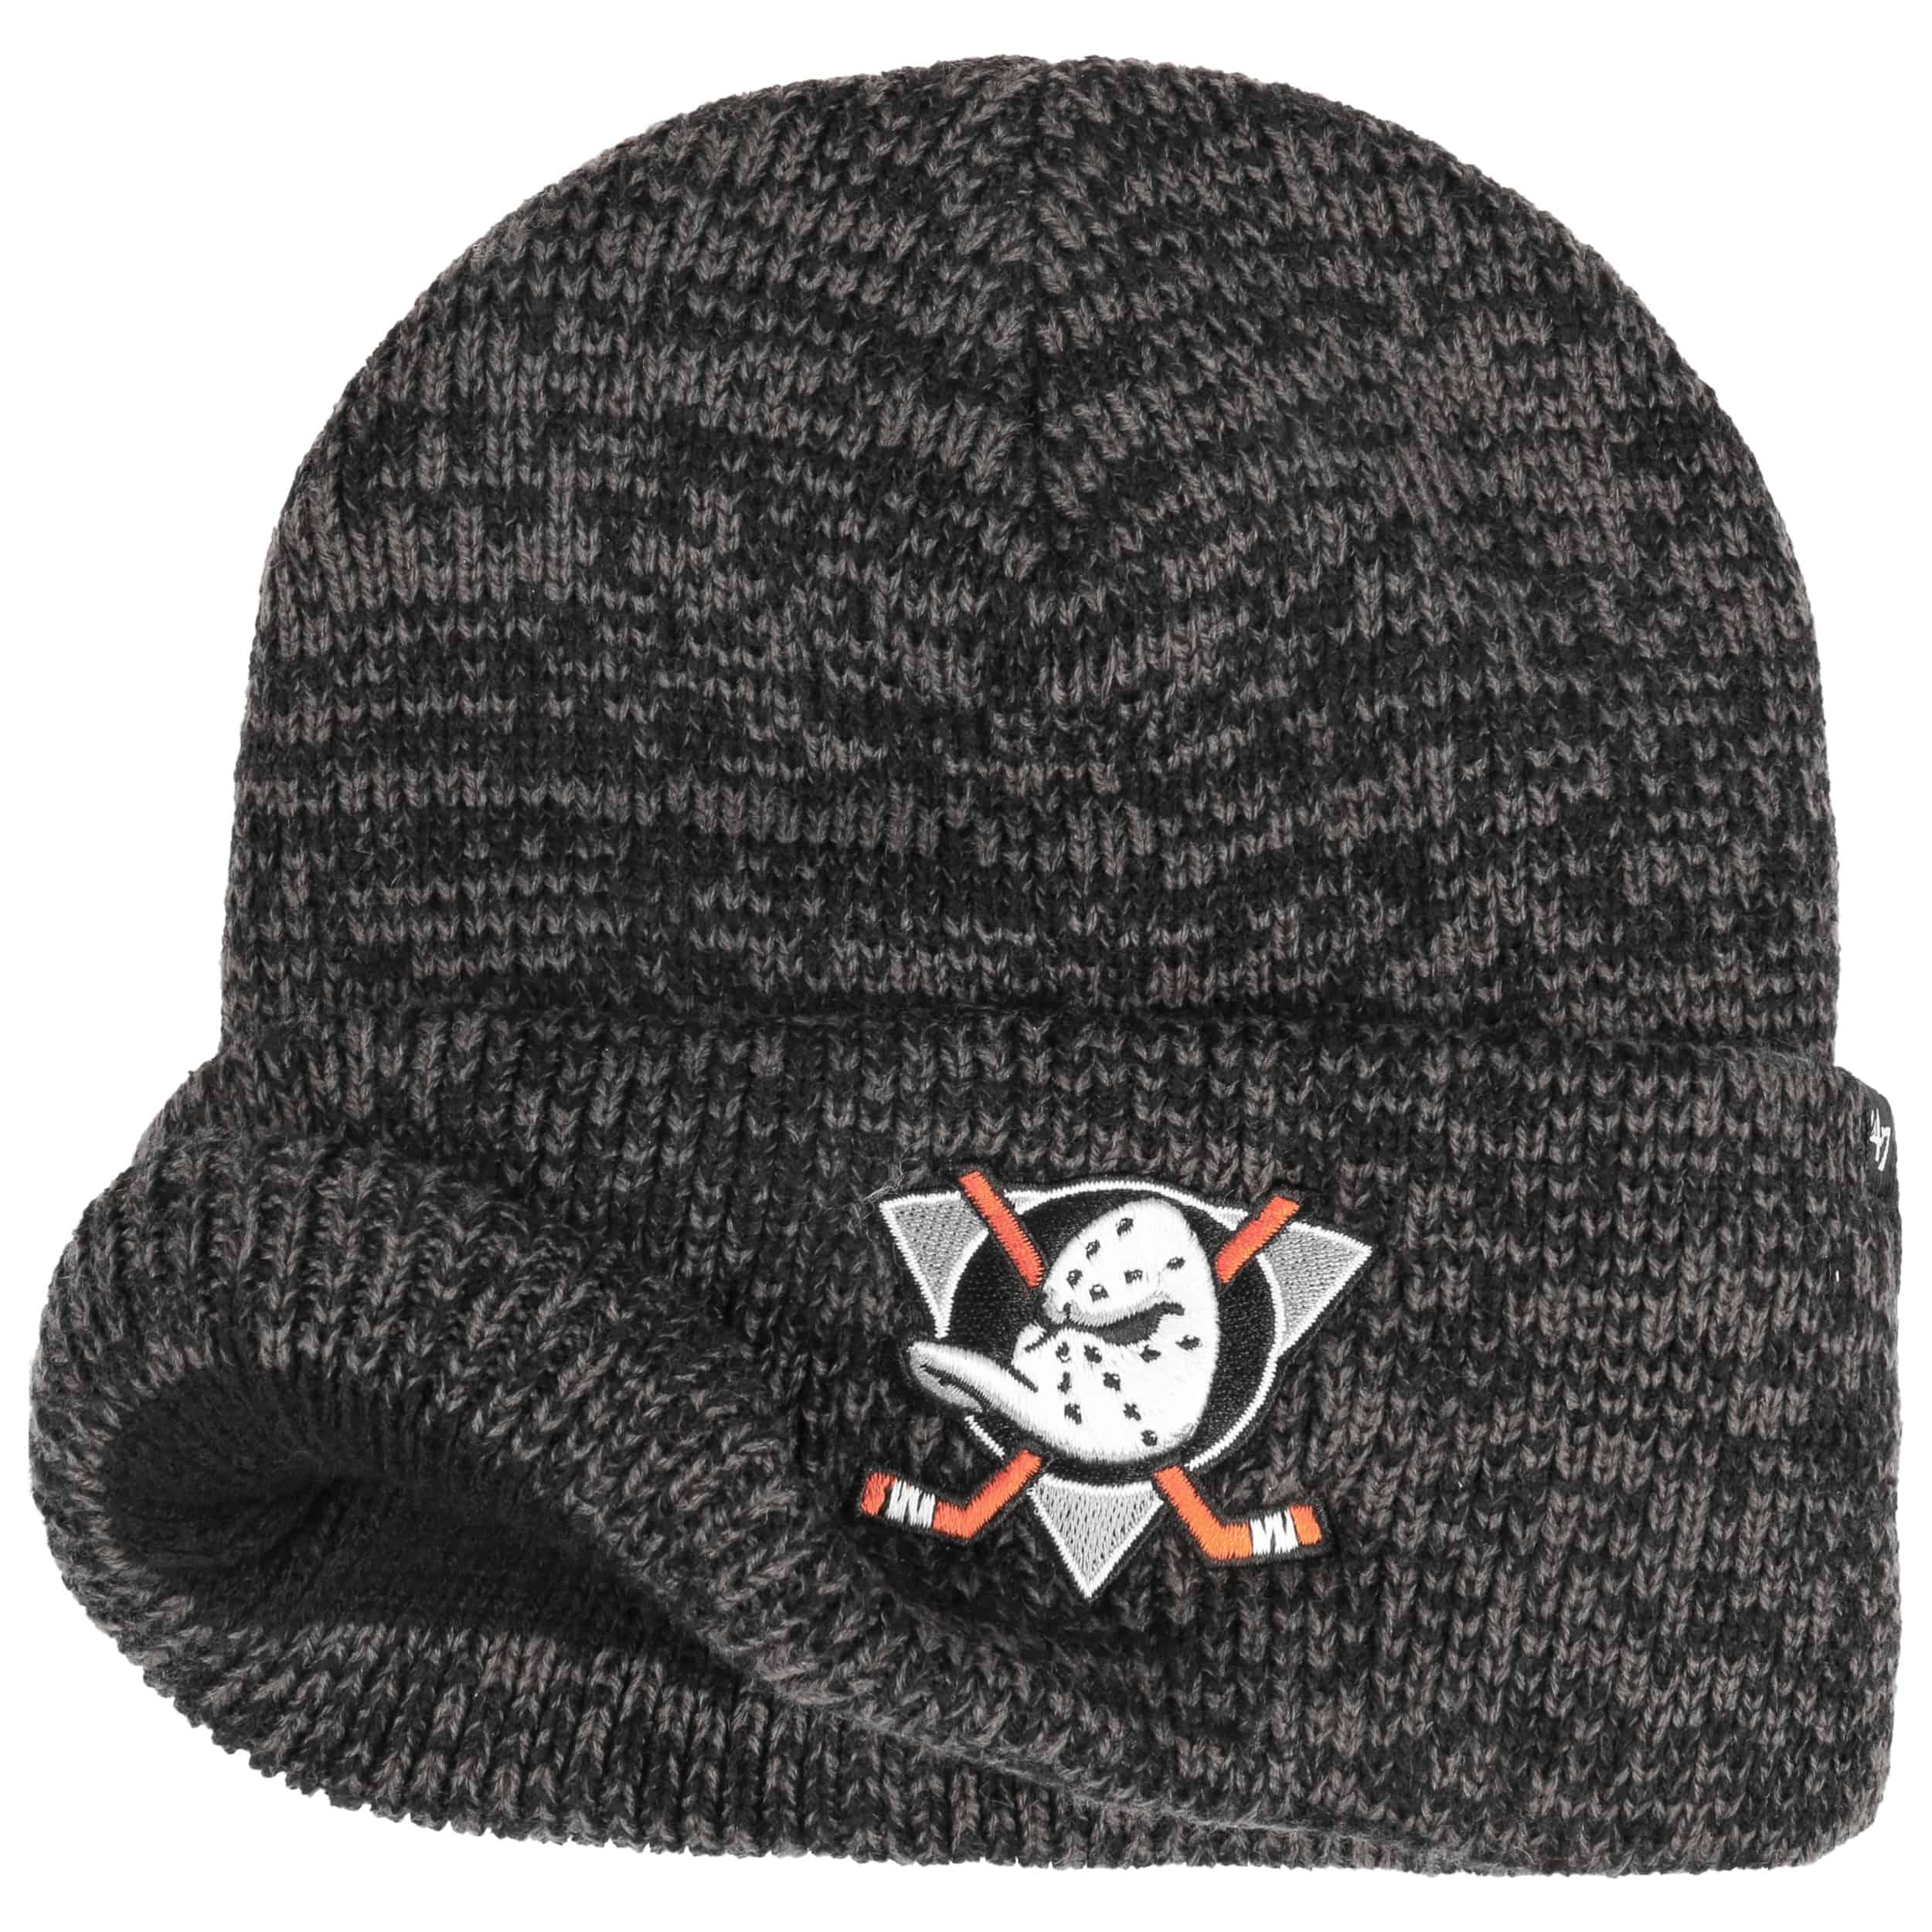 47 Brand Beanie Anaheim Ducks color negro y gris Zapatillas talla /única